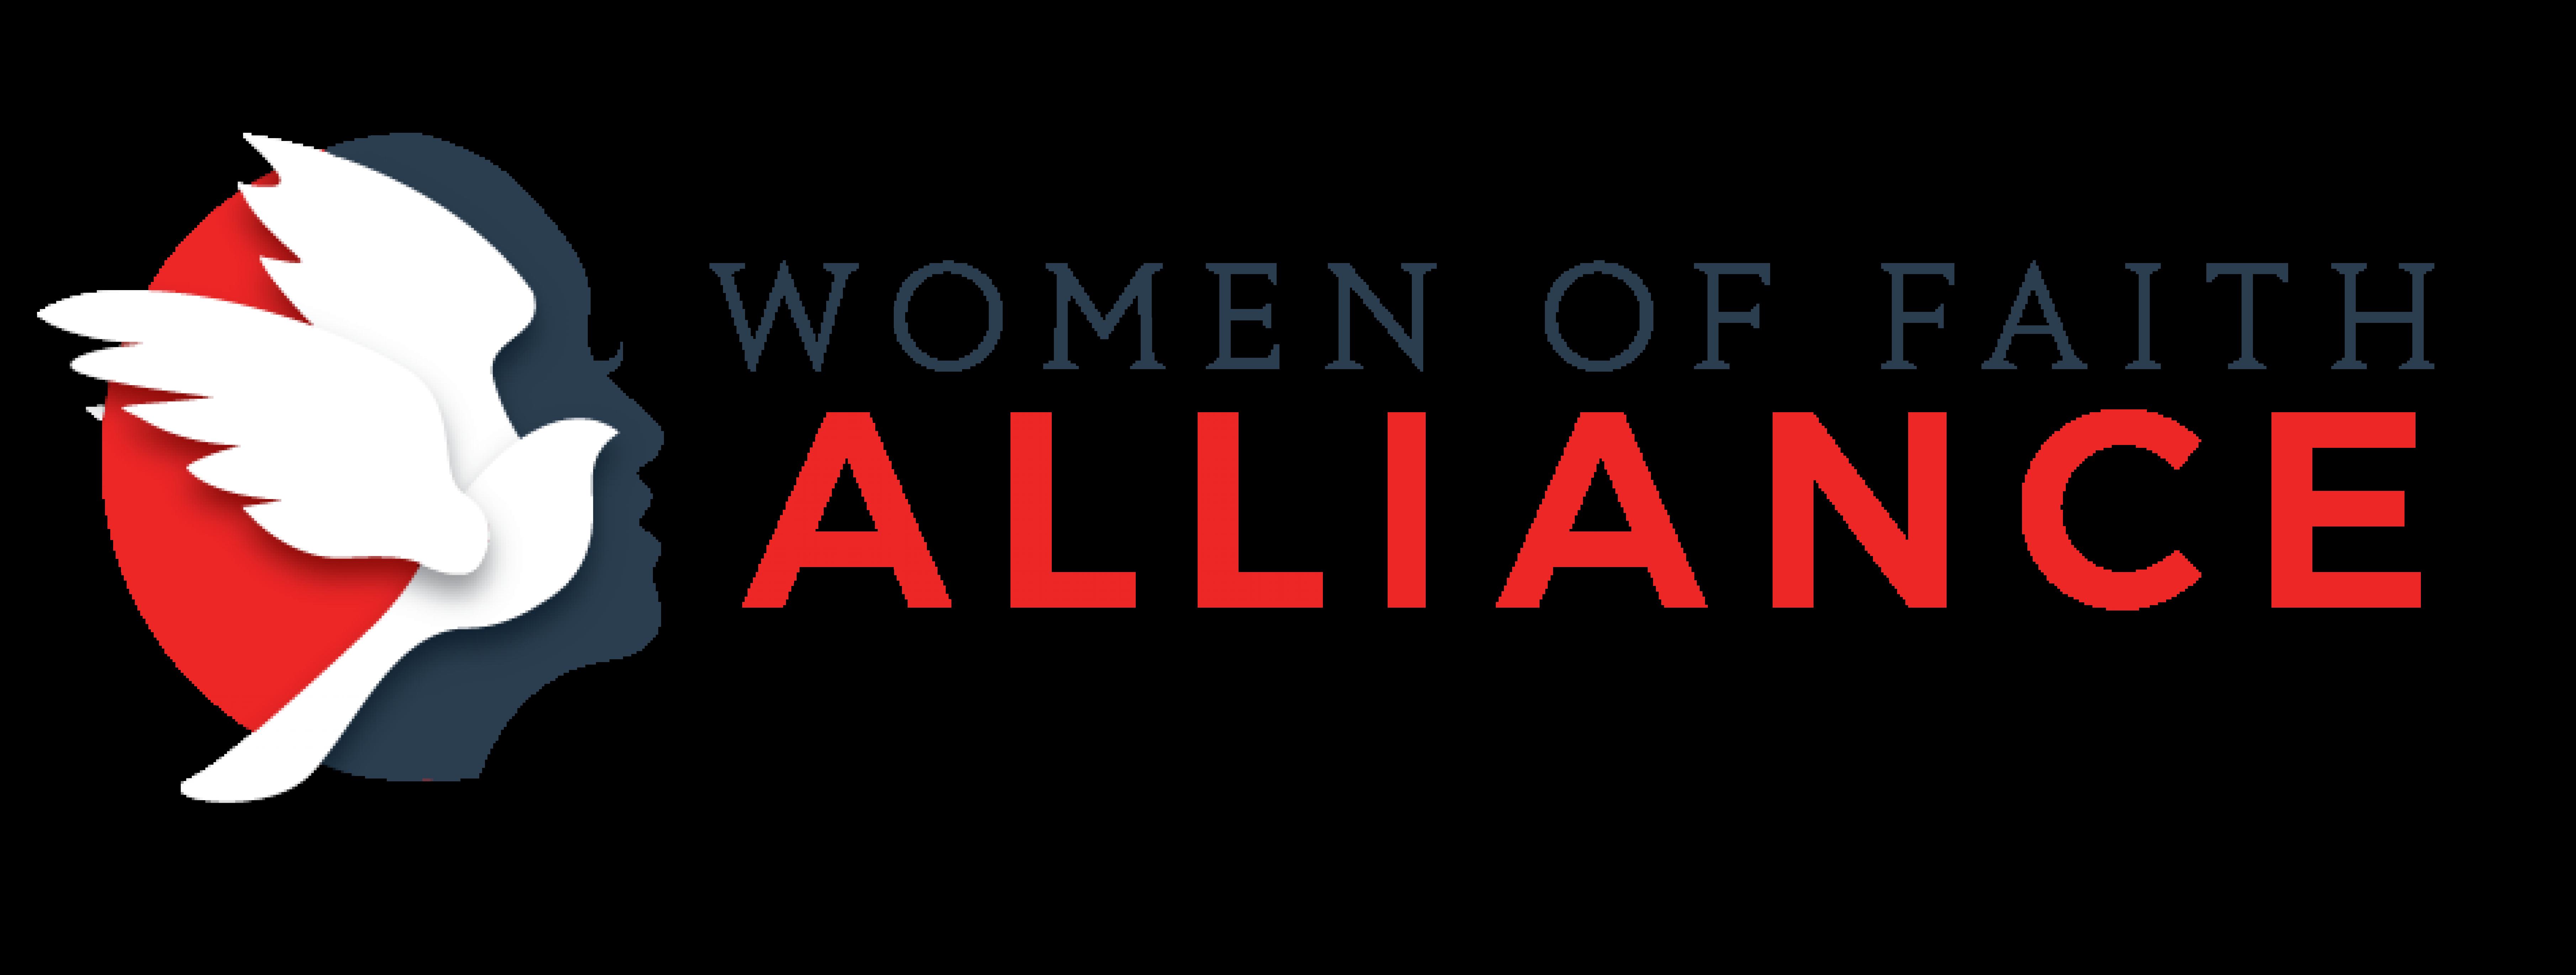 Women of Faith Alliance – Hope brought to Kenyan women